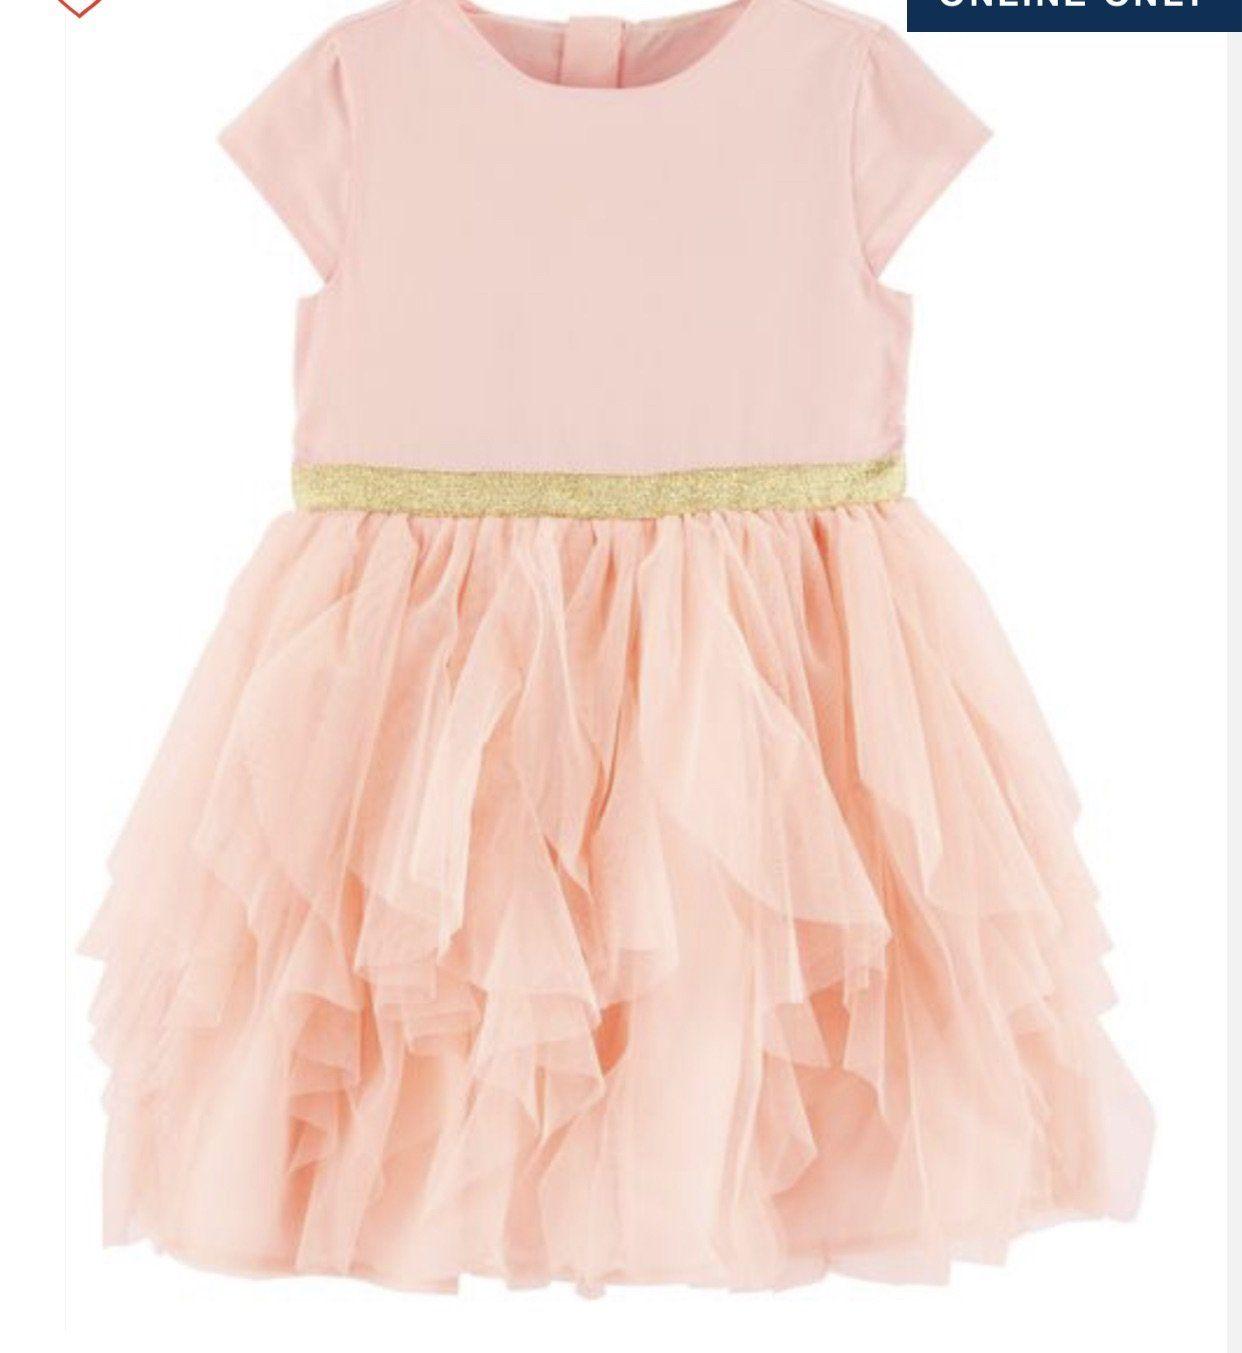 Baby Matchingclothes Bobbydaleearnhardt.com